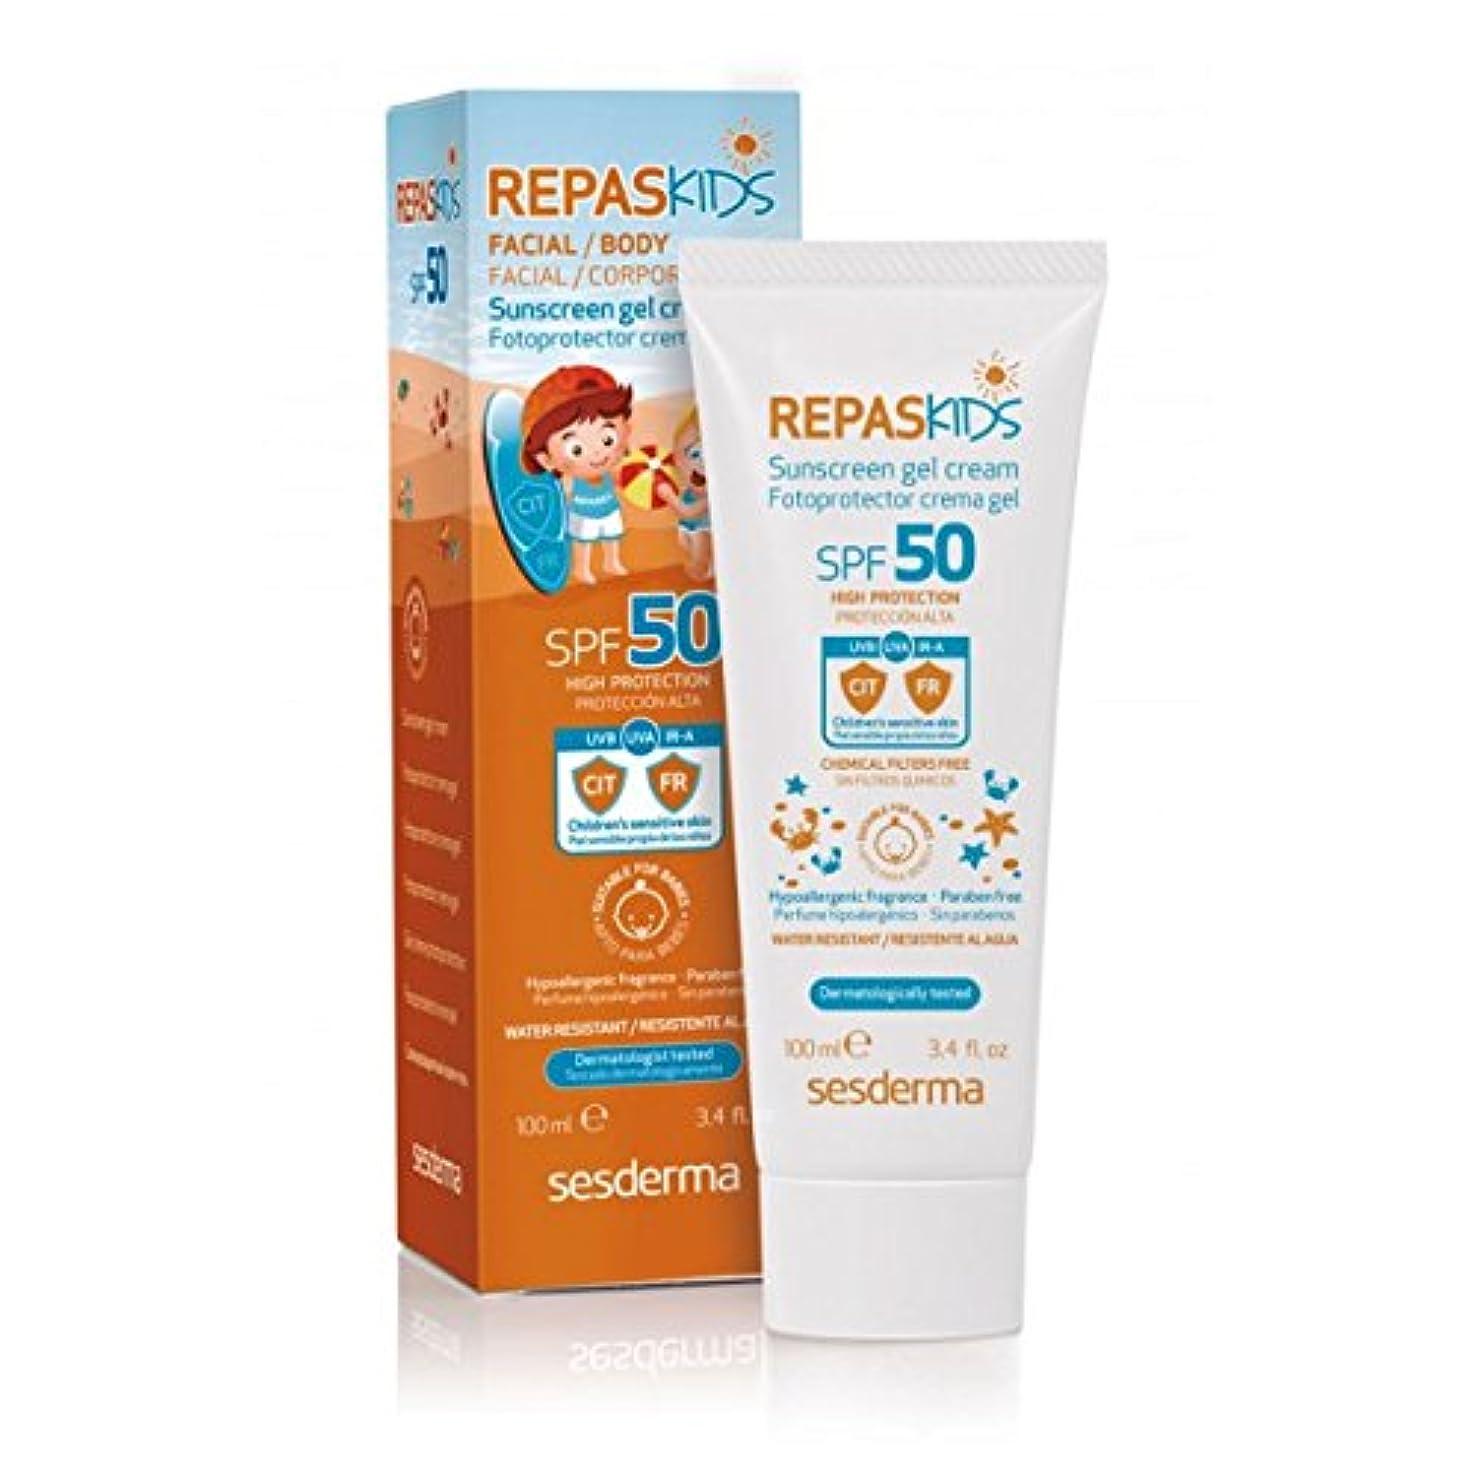 不適当各適度なSesderma Repaskids Sunscreen Gel Cream Spf50 100ml [並行輸入品]